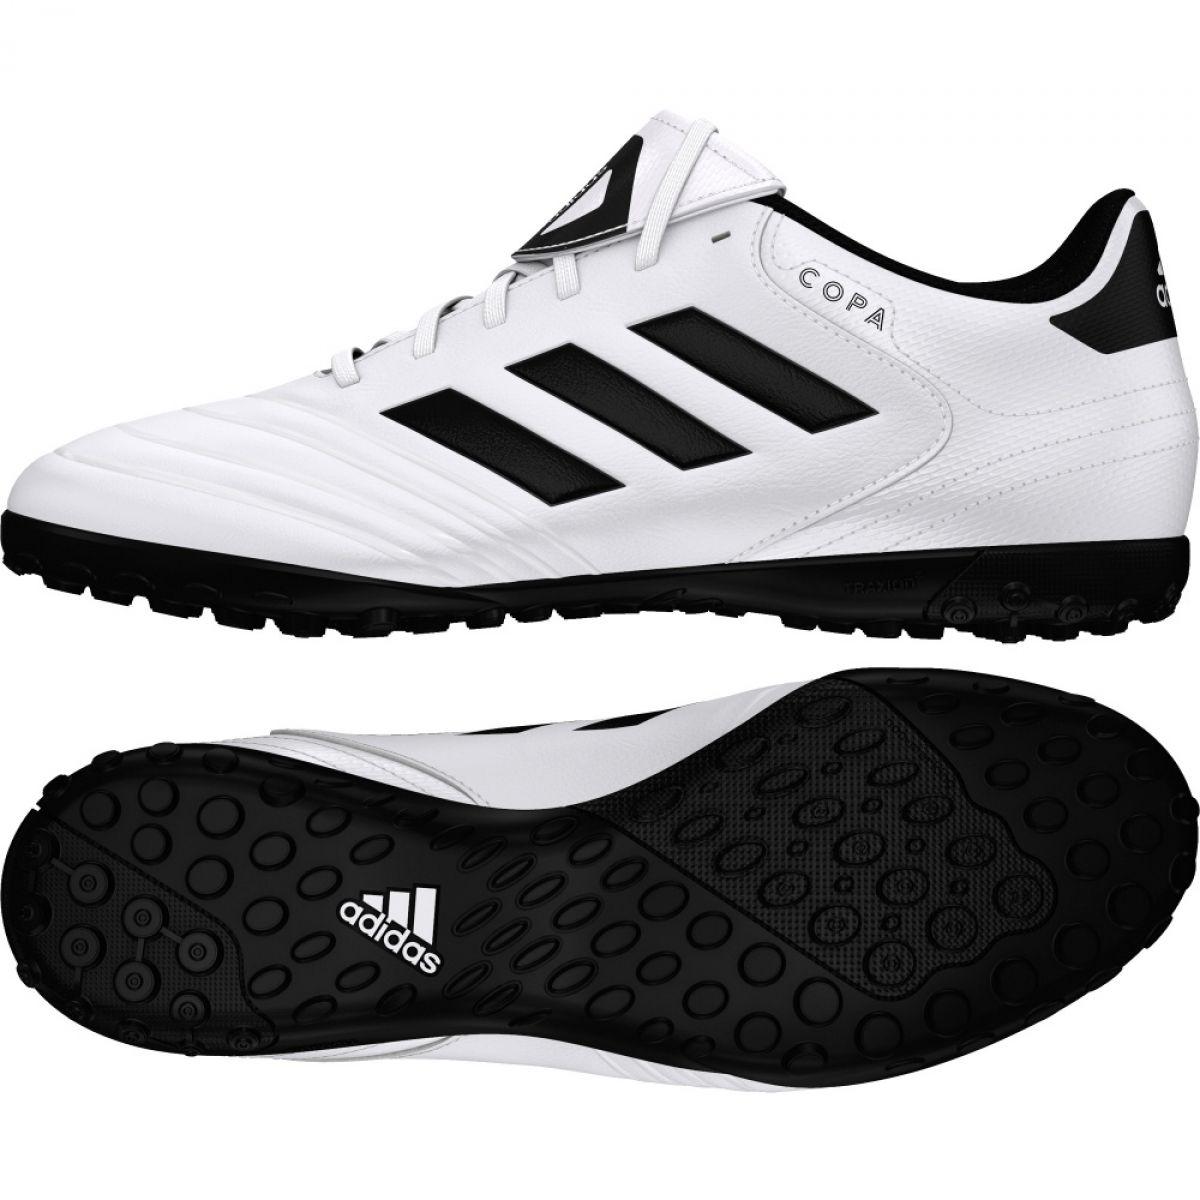 best sneakers 26bff c232f Buty adidas Copa Tango 18.4 TF CP8974 44